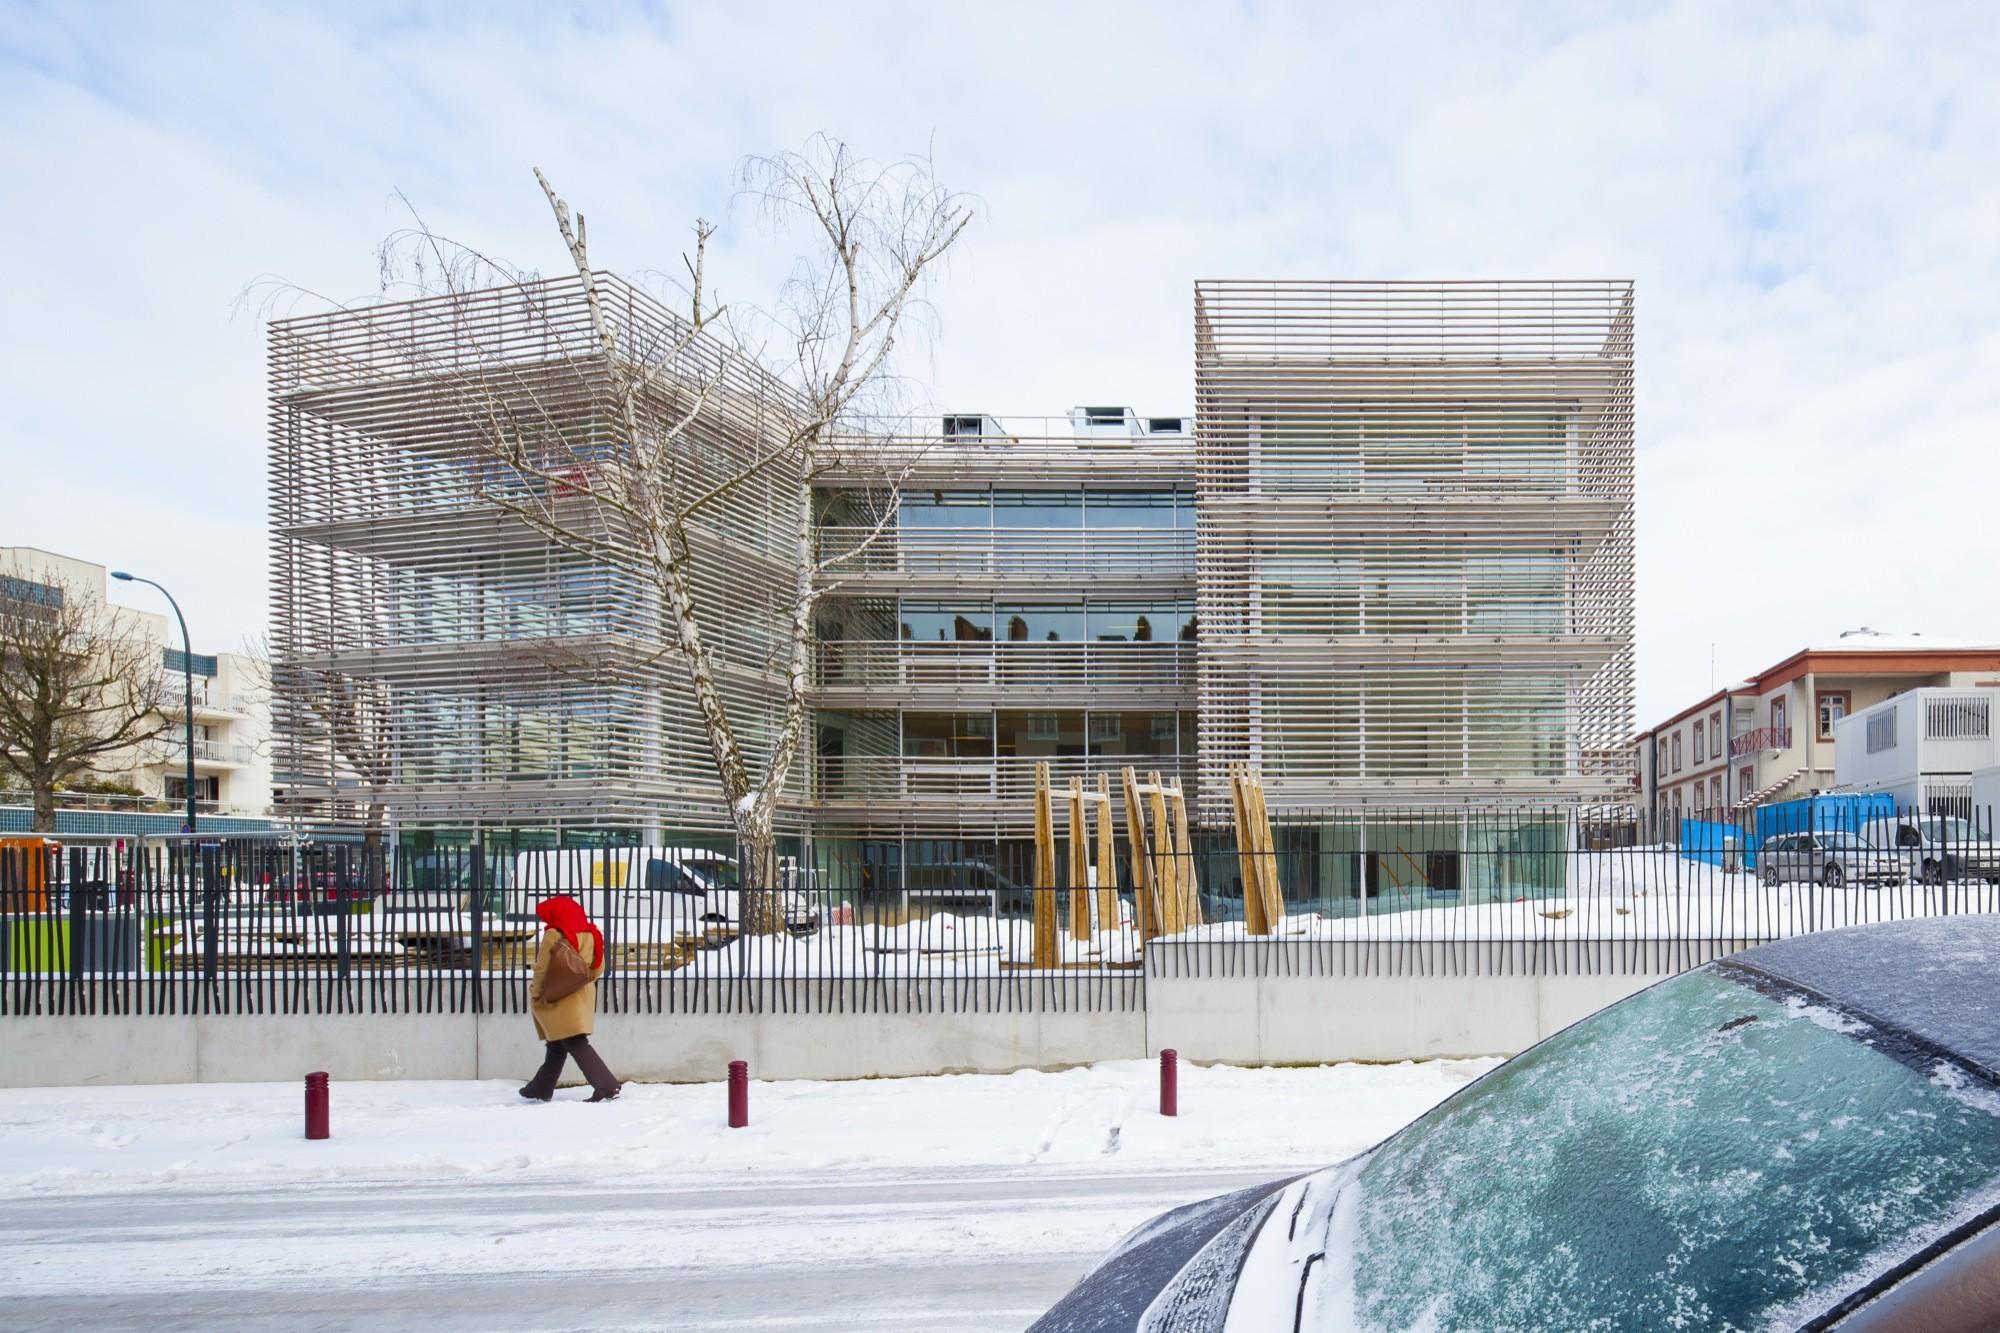 Gallery of maison de retraite philippe dubus architecte 15 for Architecture maison de retraite